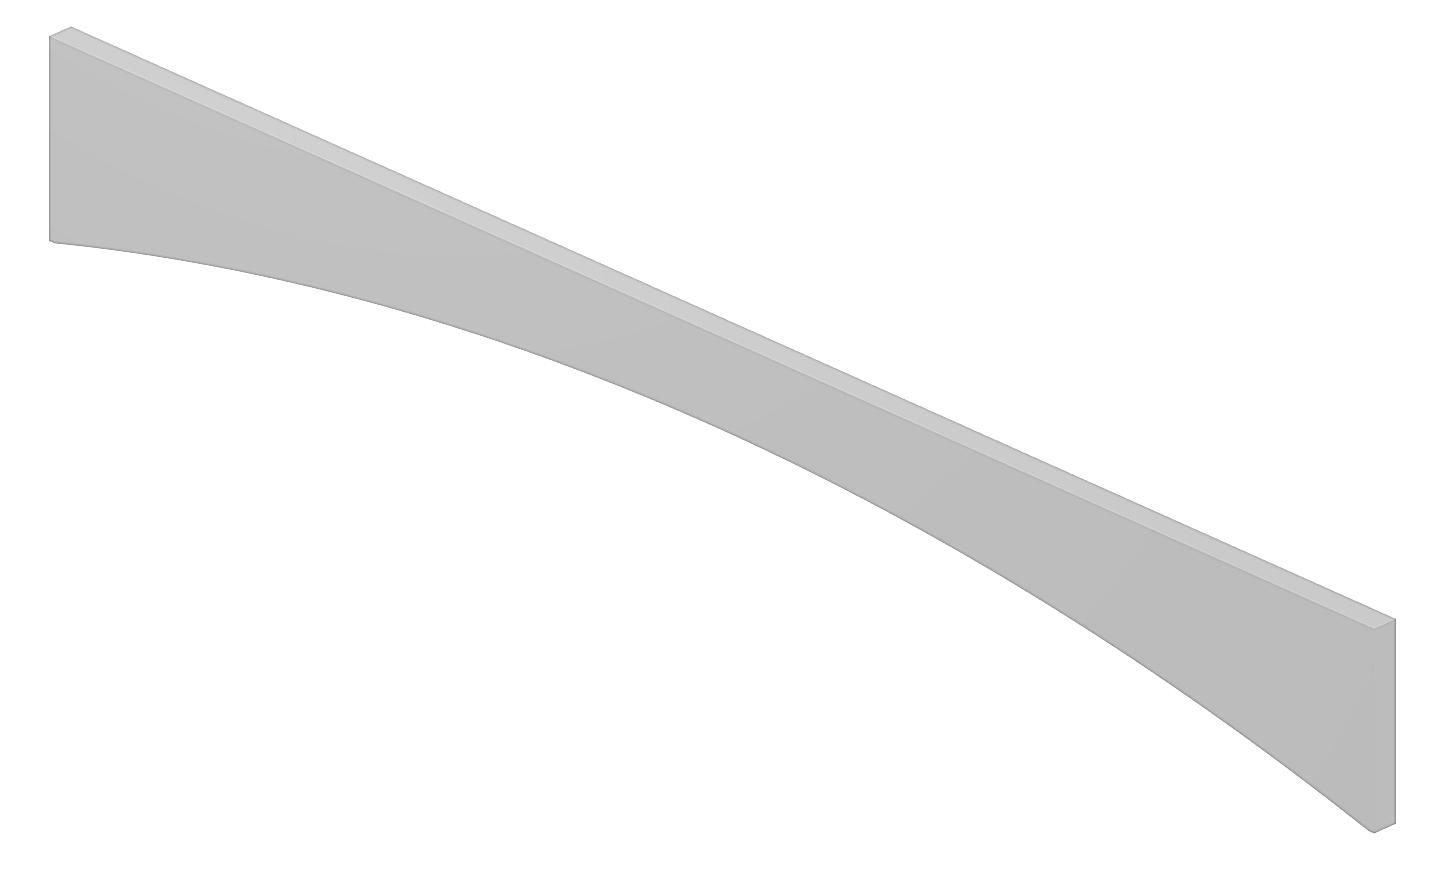 VA48 Arched Valance Shaker White